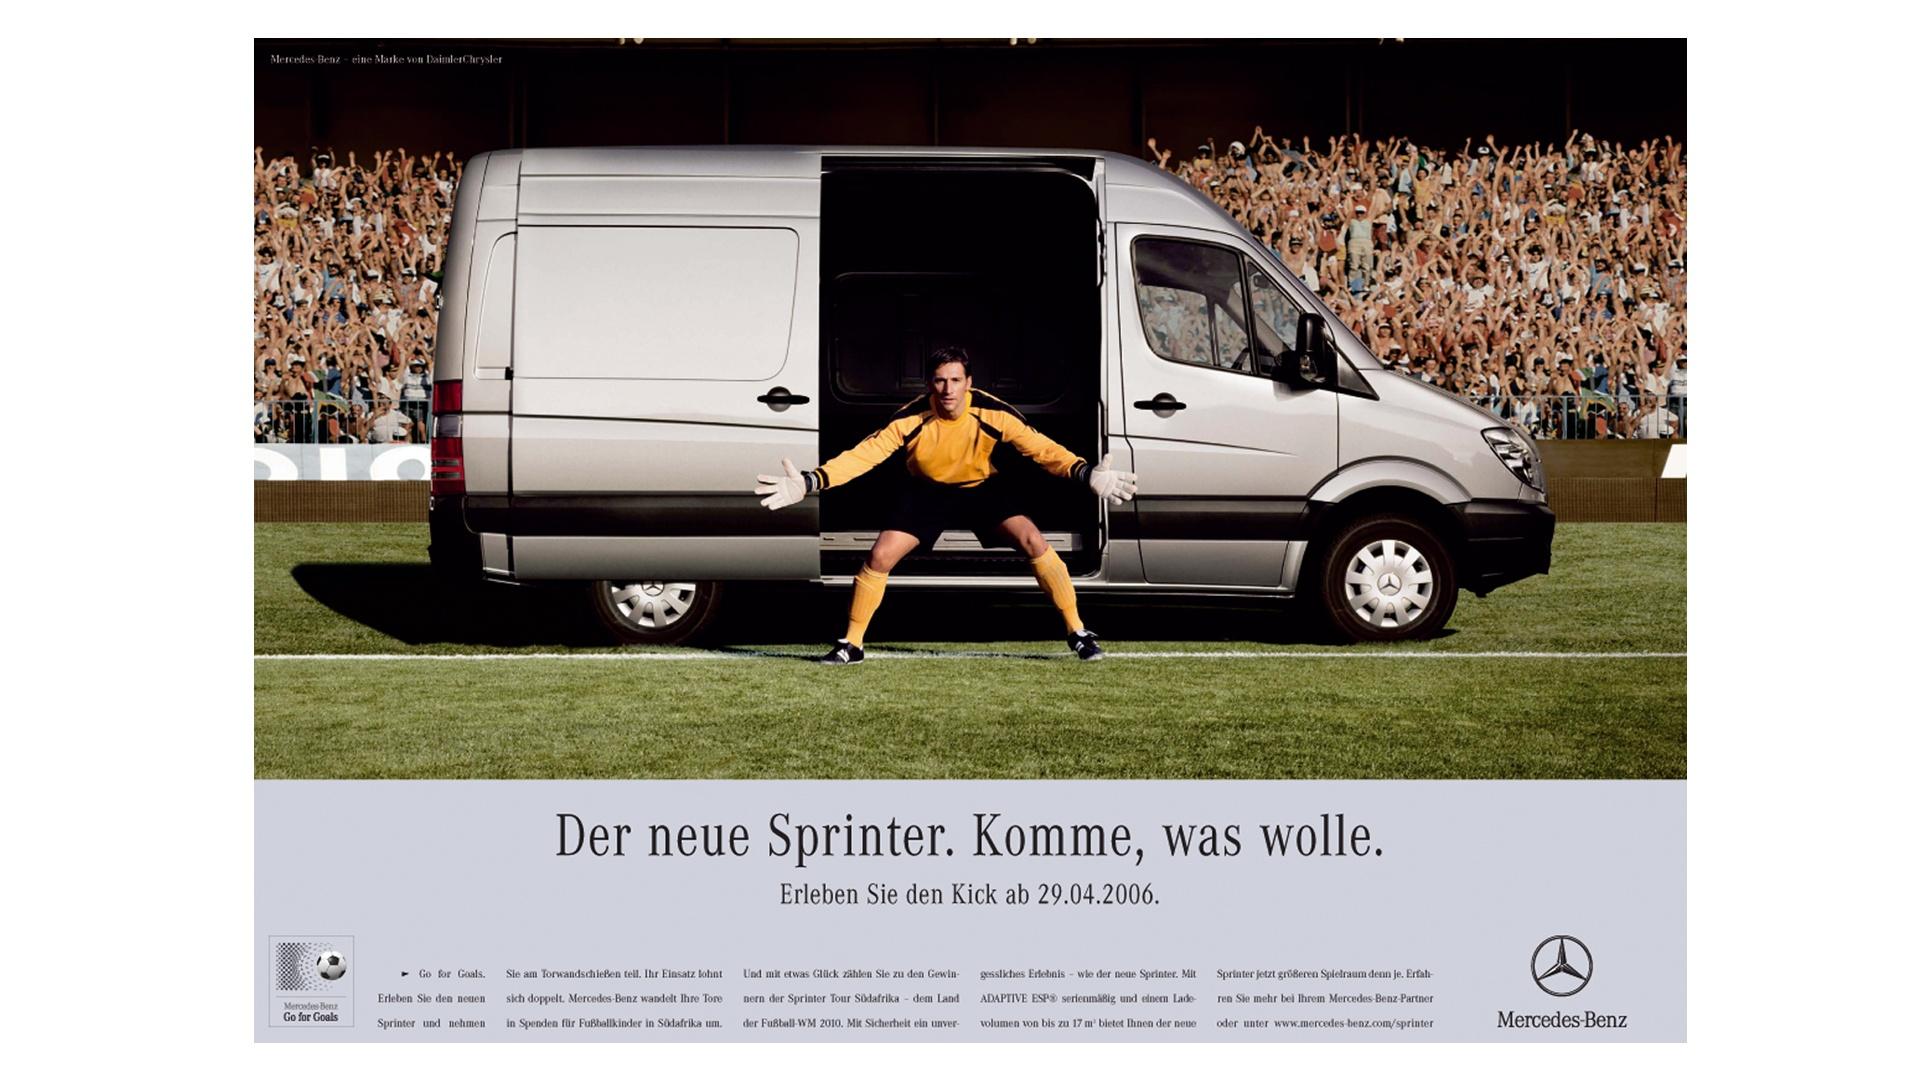 Daimler Anzeige Go for Goals